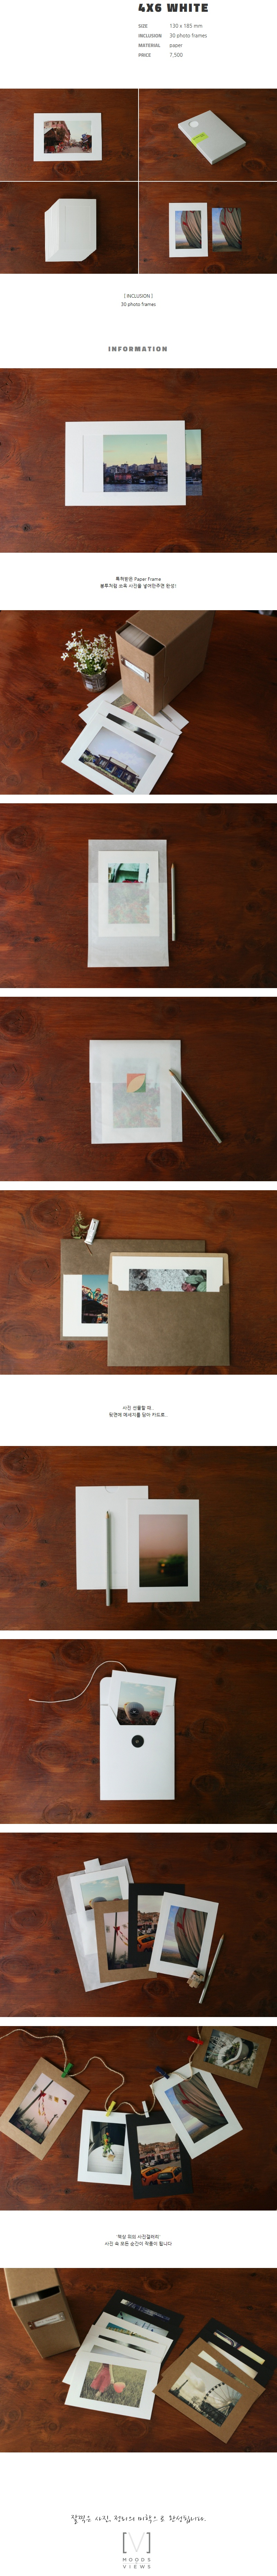 4x6 포토박스-리필 (화이트) - 무즈앤뷰즈, 7,500원, 테마앨범/테마북, 포토박스/프레임